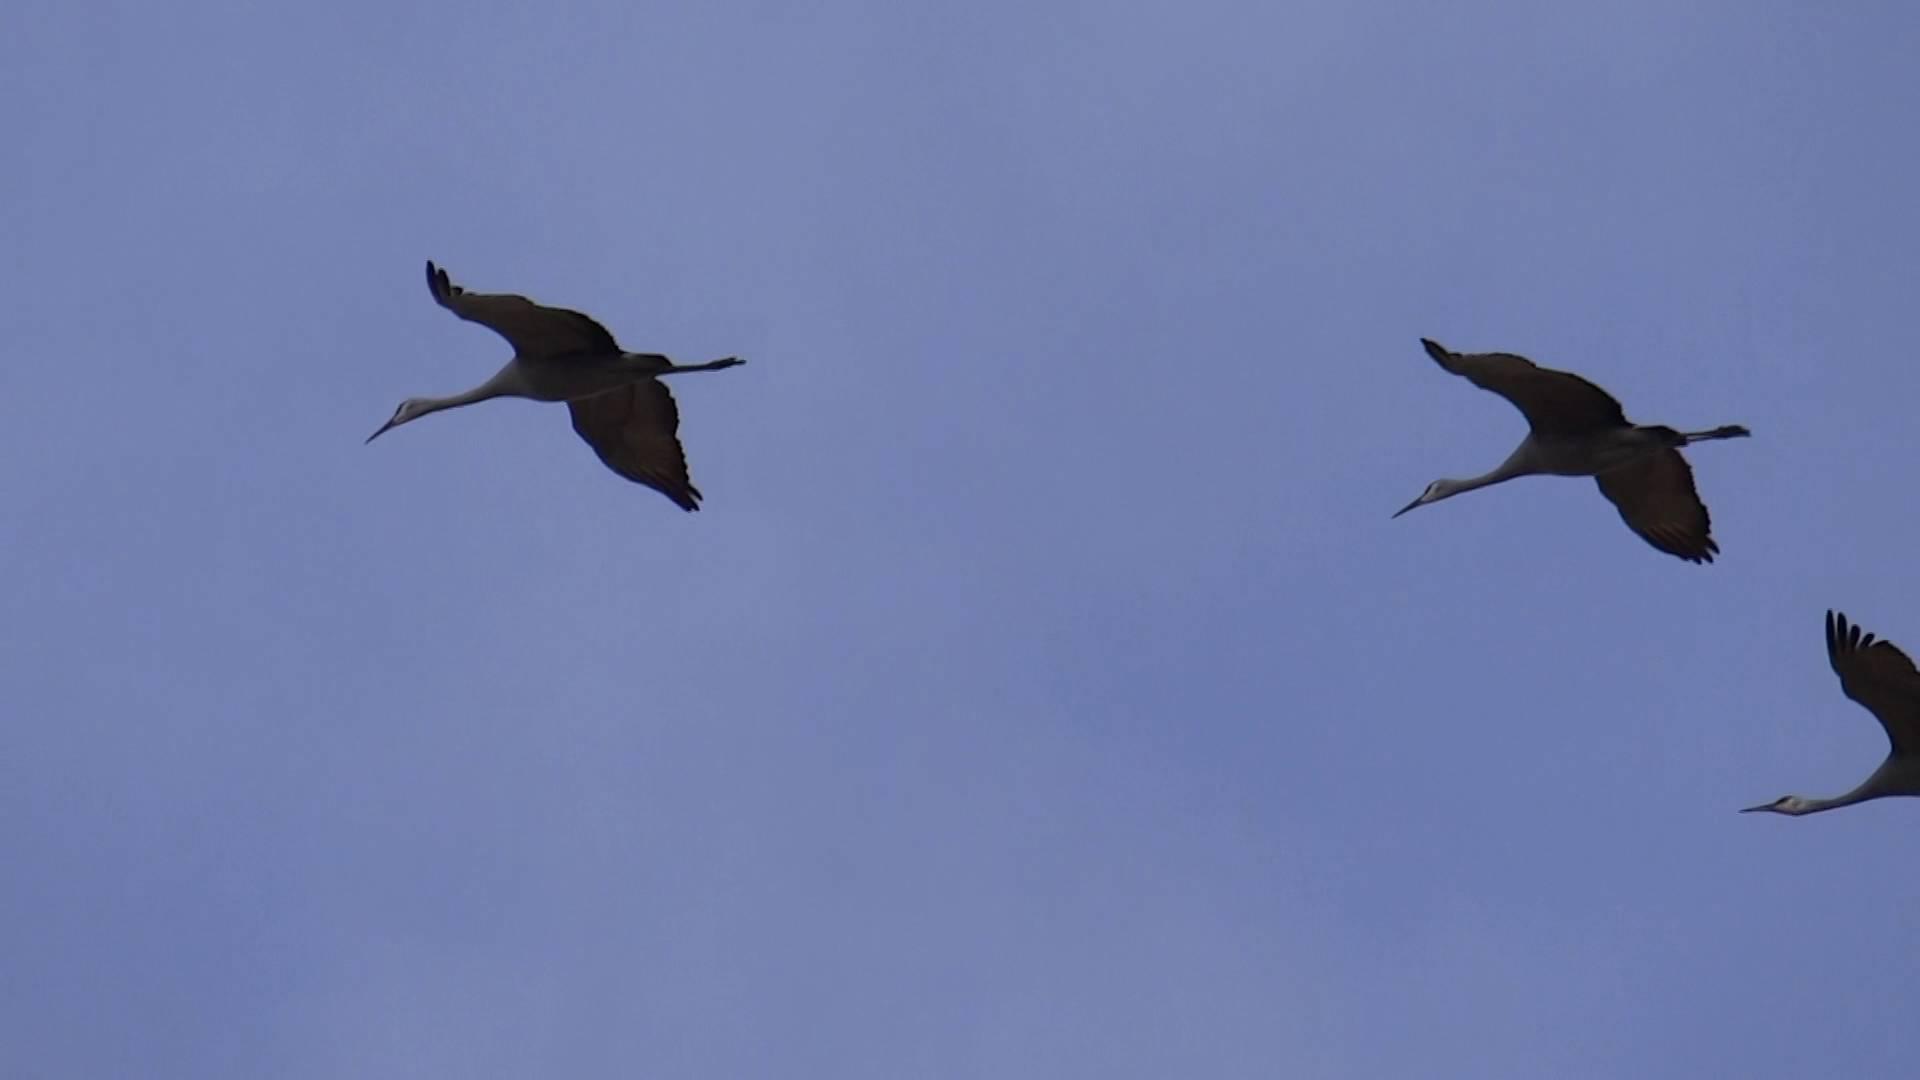 Sandhill cranes flying photo